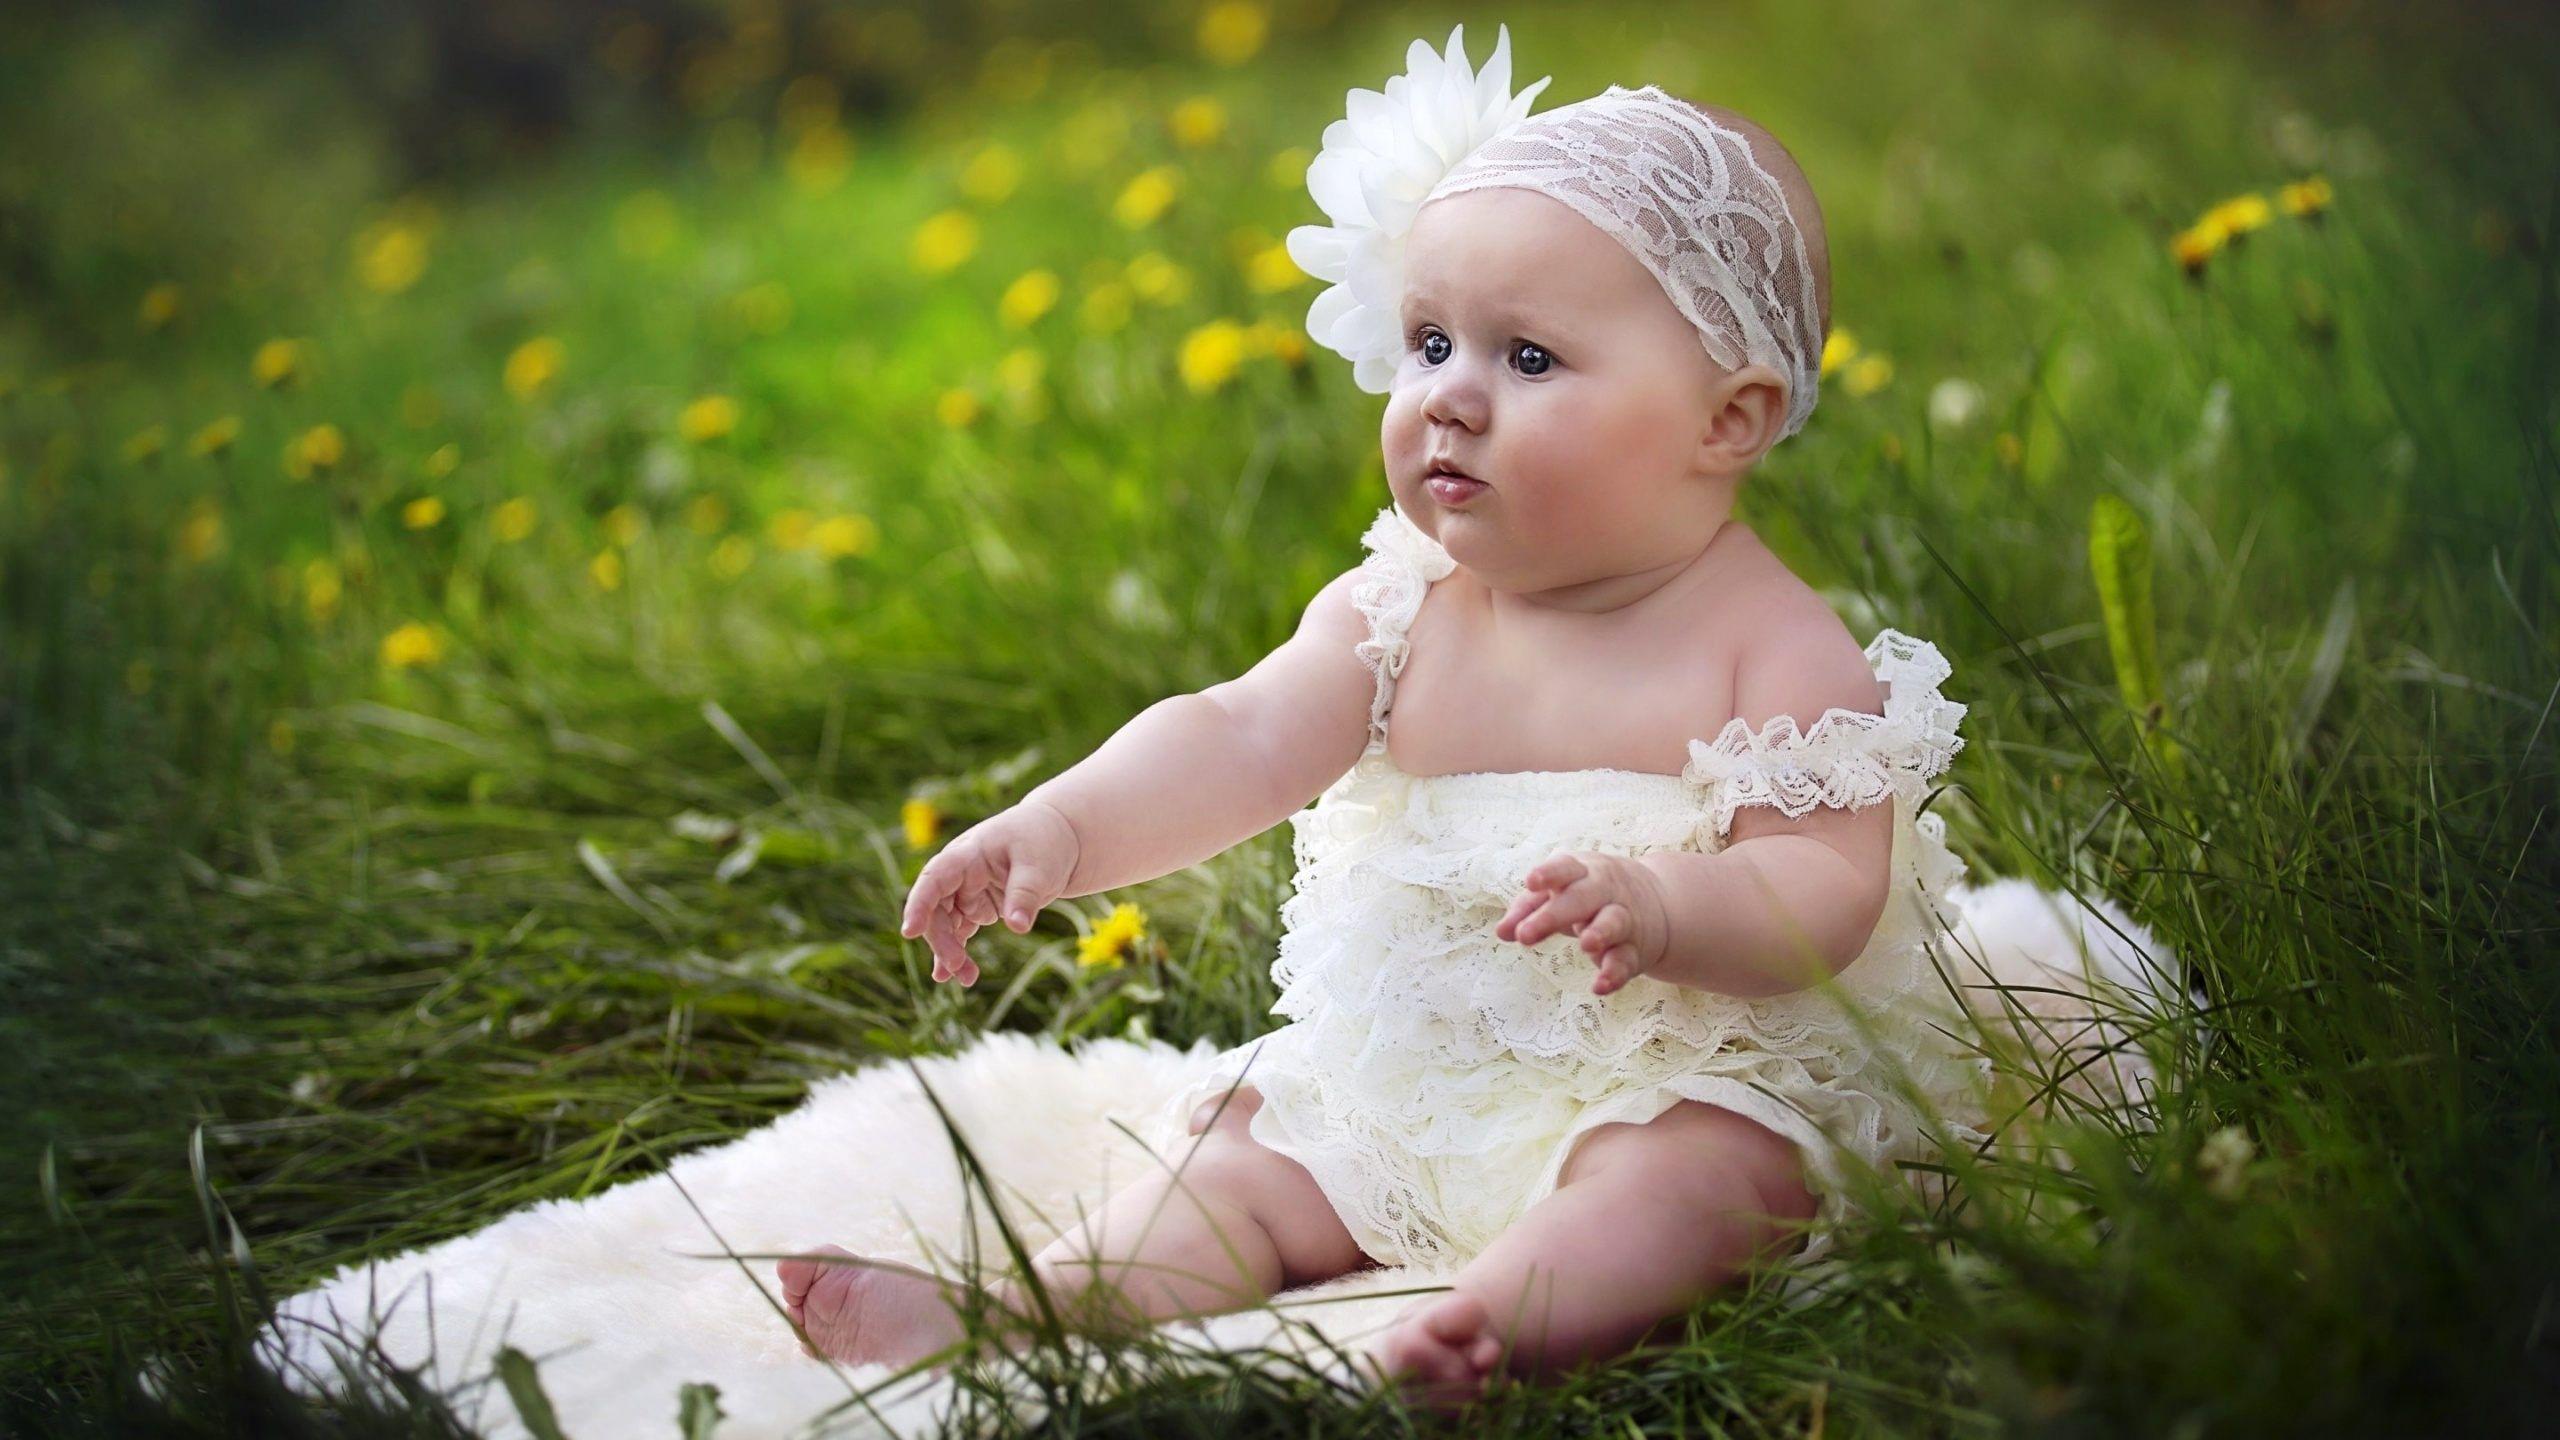 sweet babies wallpaper picture for desktop | precious peeps